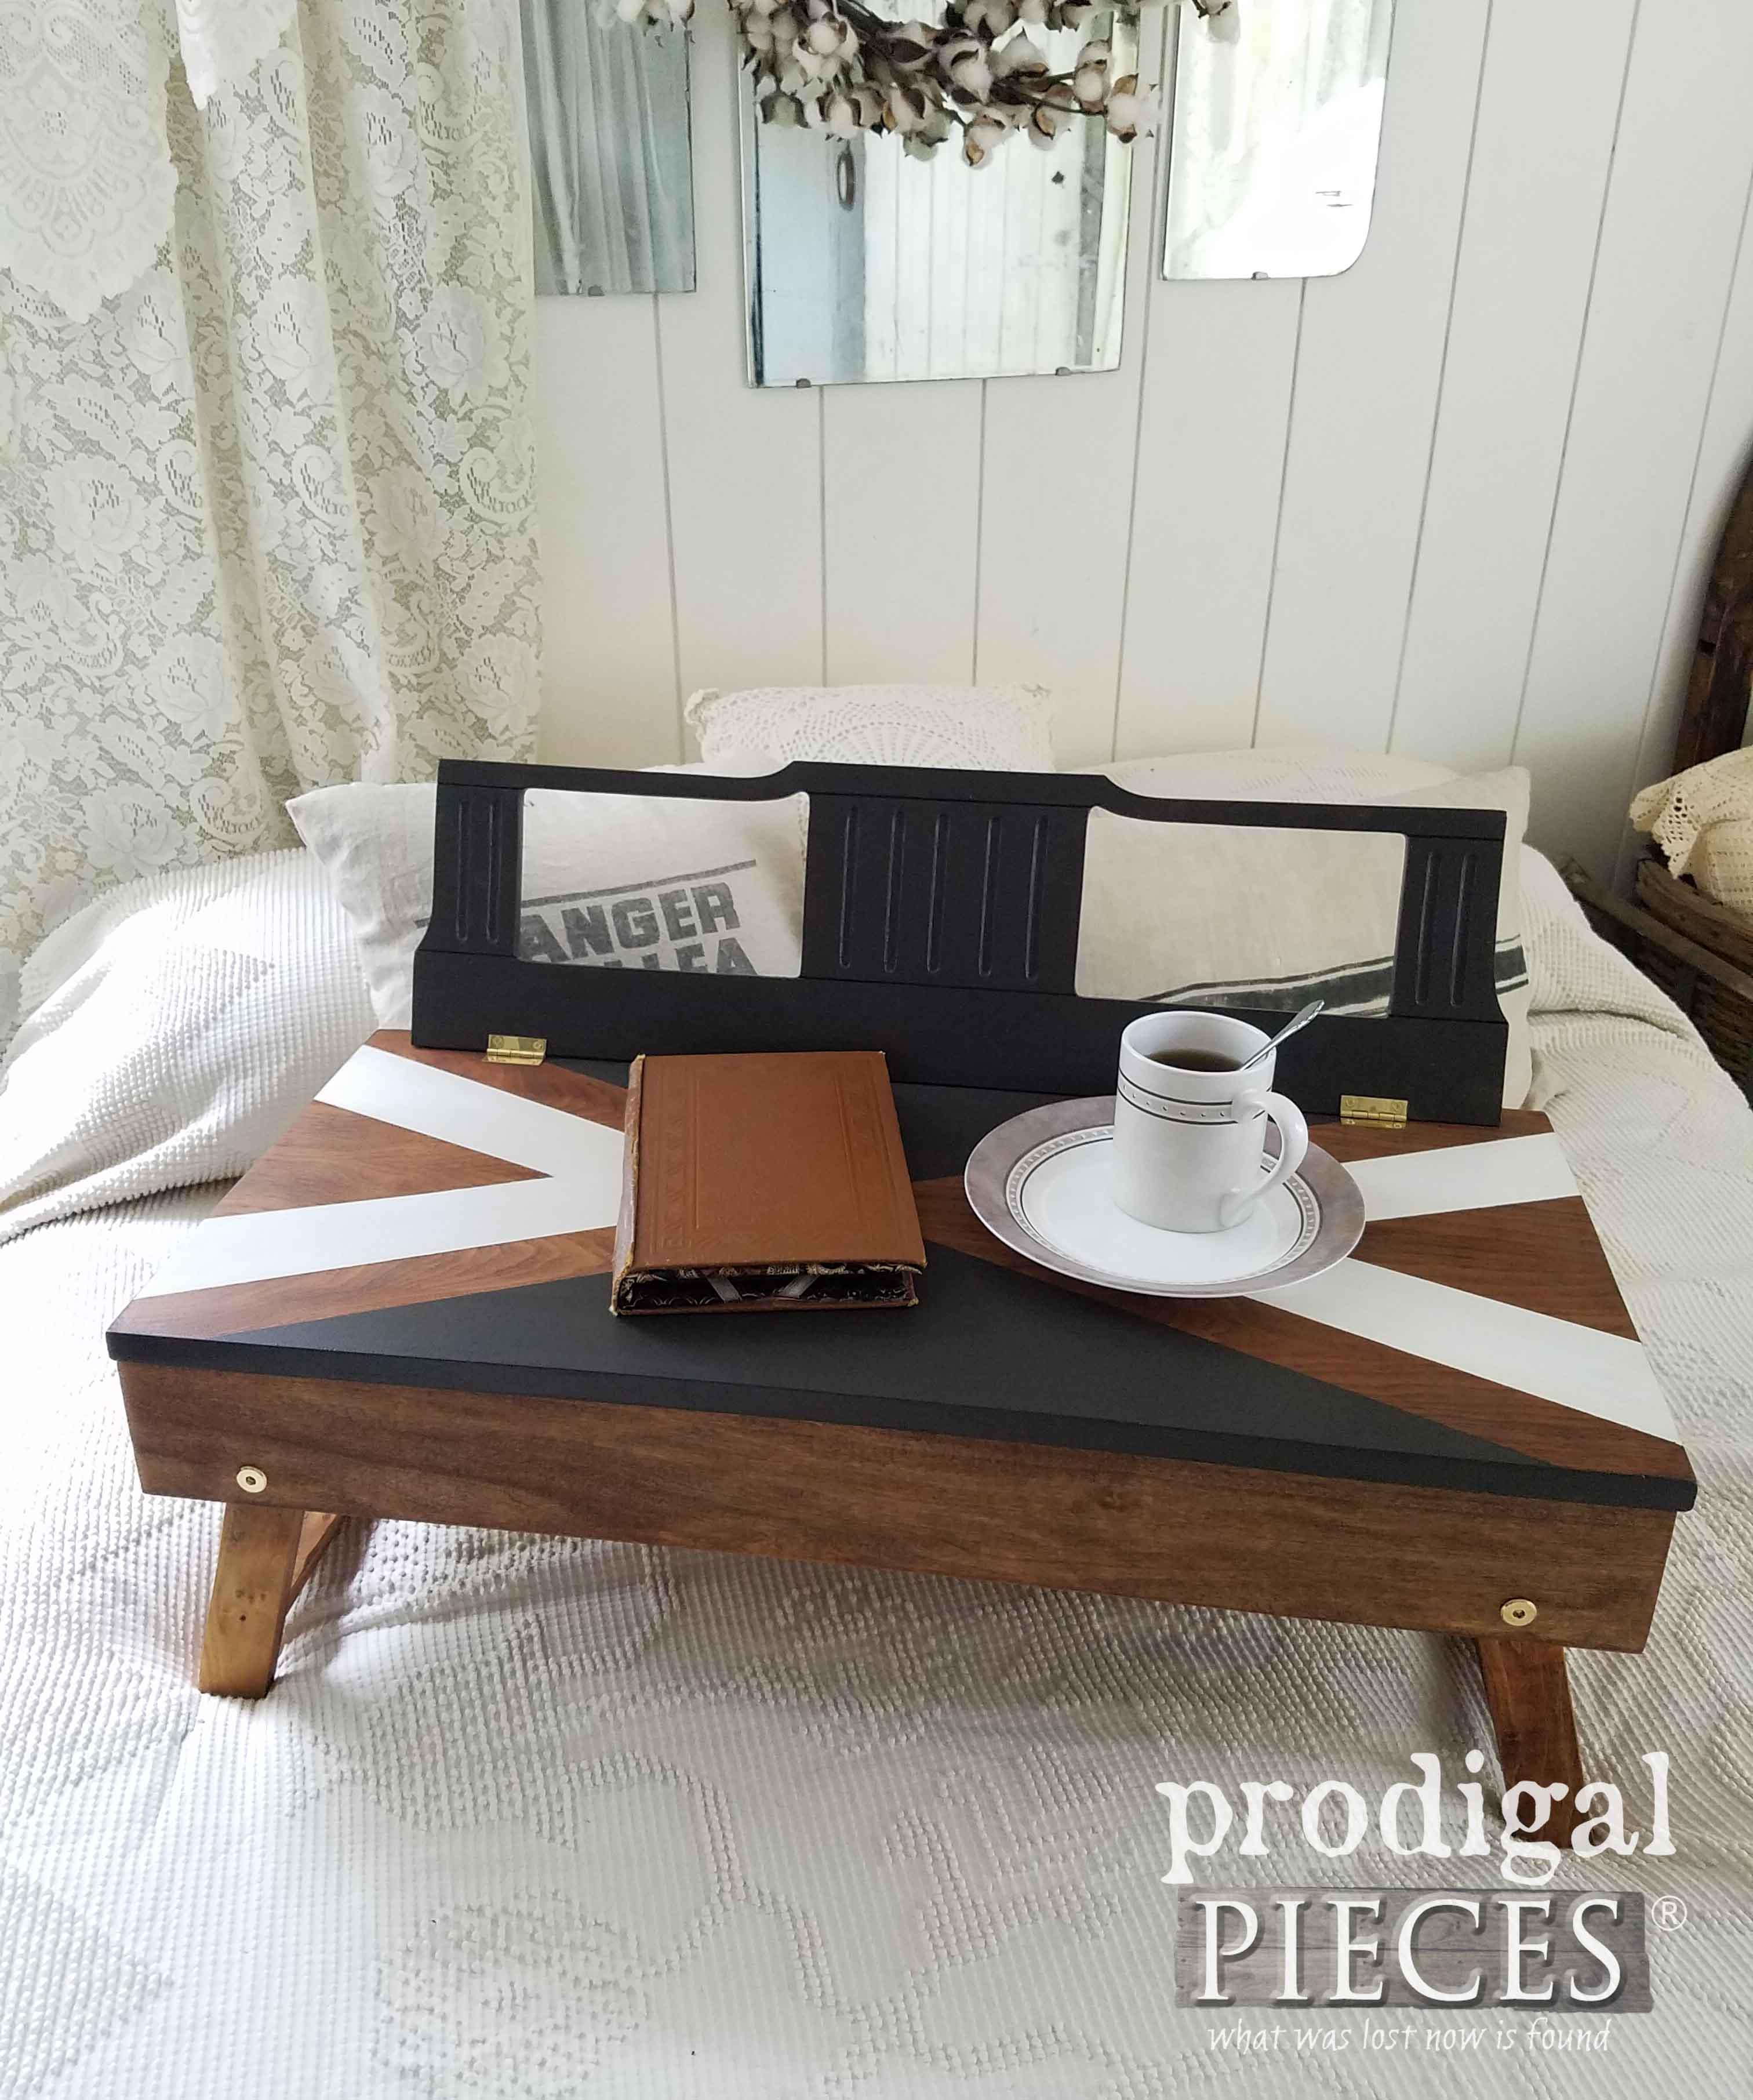 Repurposed Piano Bench Lap Desk Prodigal Pieces